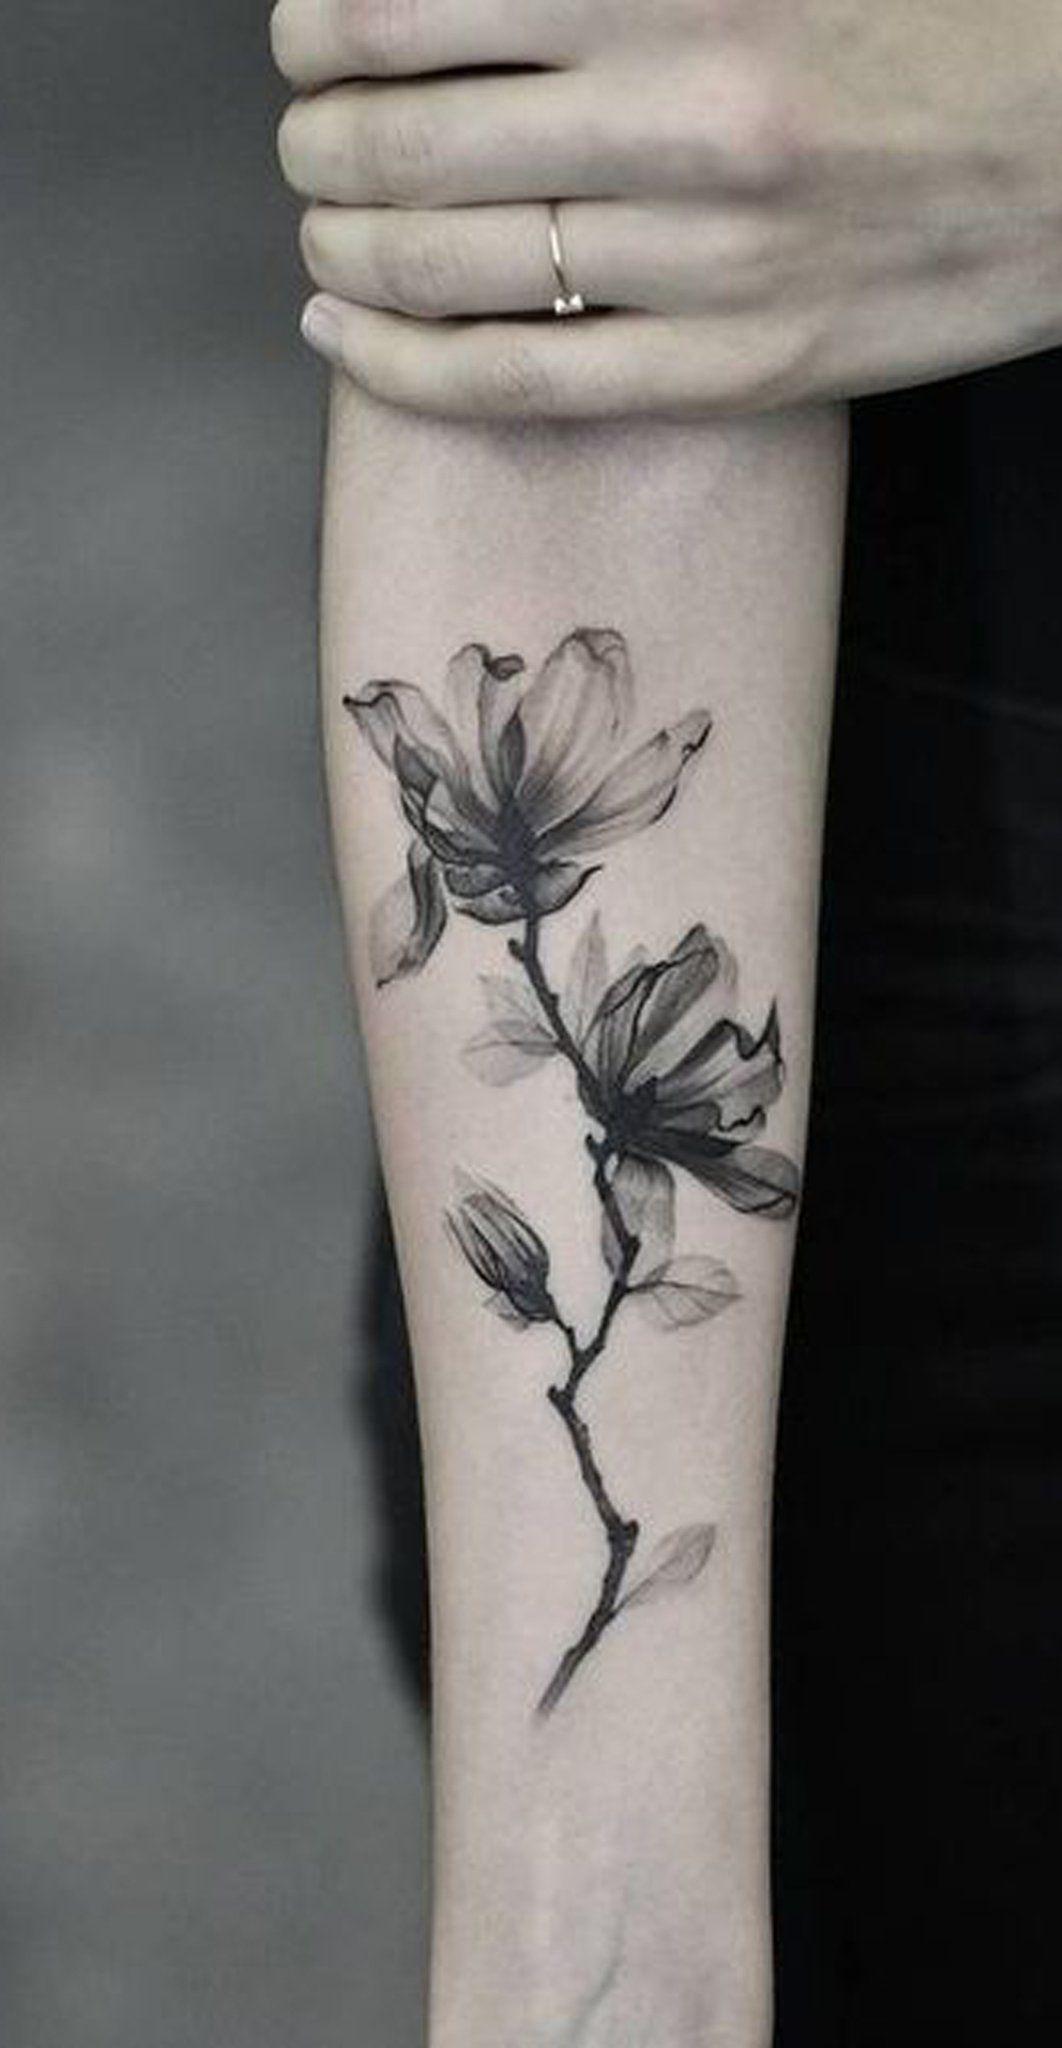 Watercolor Black Magnolia Forearm Tattoo Ideas For Women Www Mybodiart Com Tattoos Delicate Flower Tattoo Forearm Tattoo Women Flower Wrist Tattoos